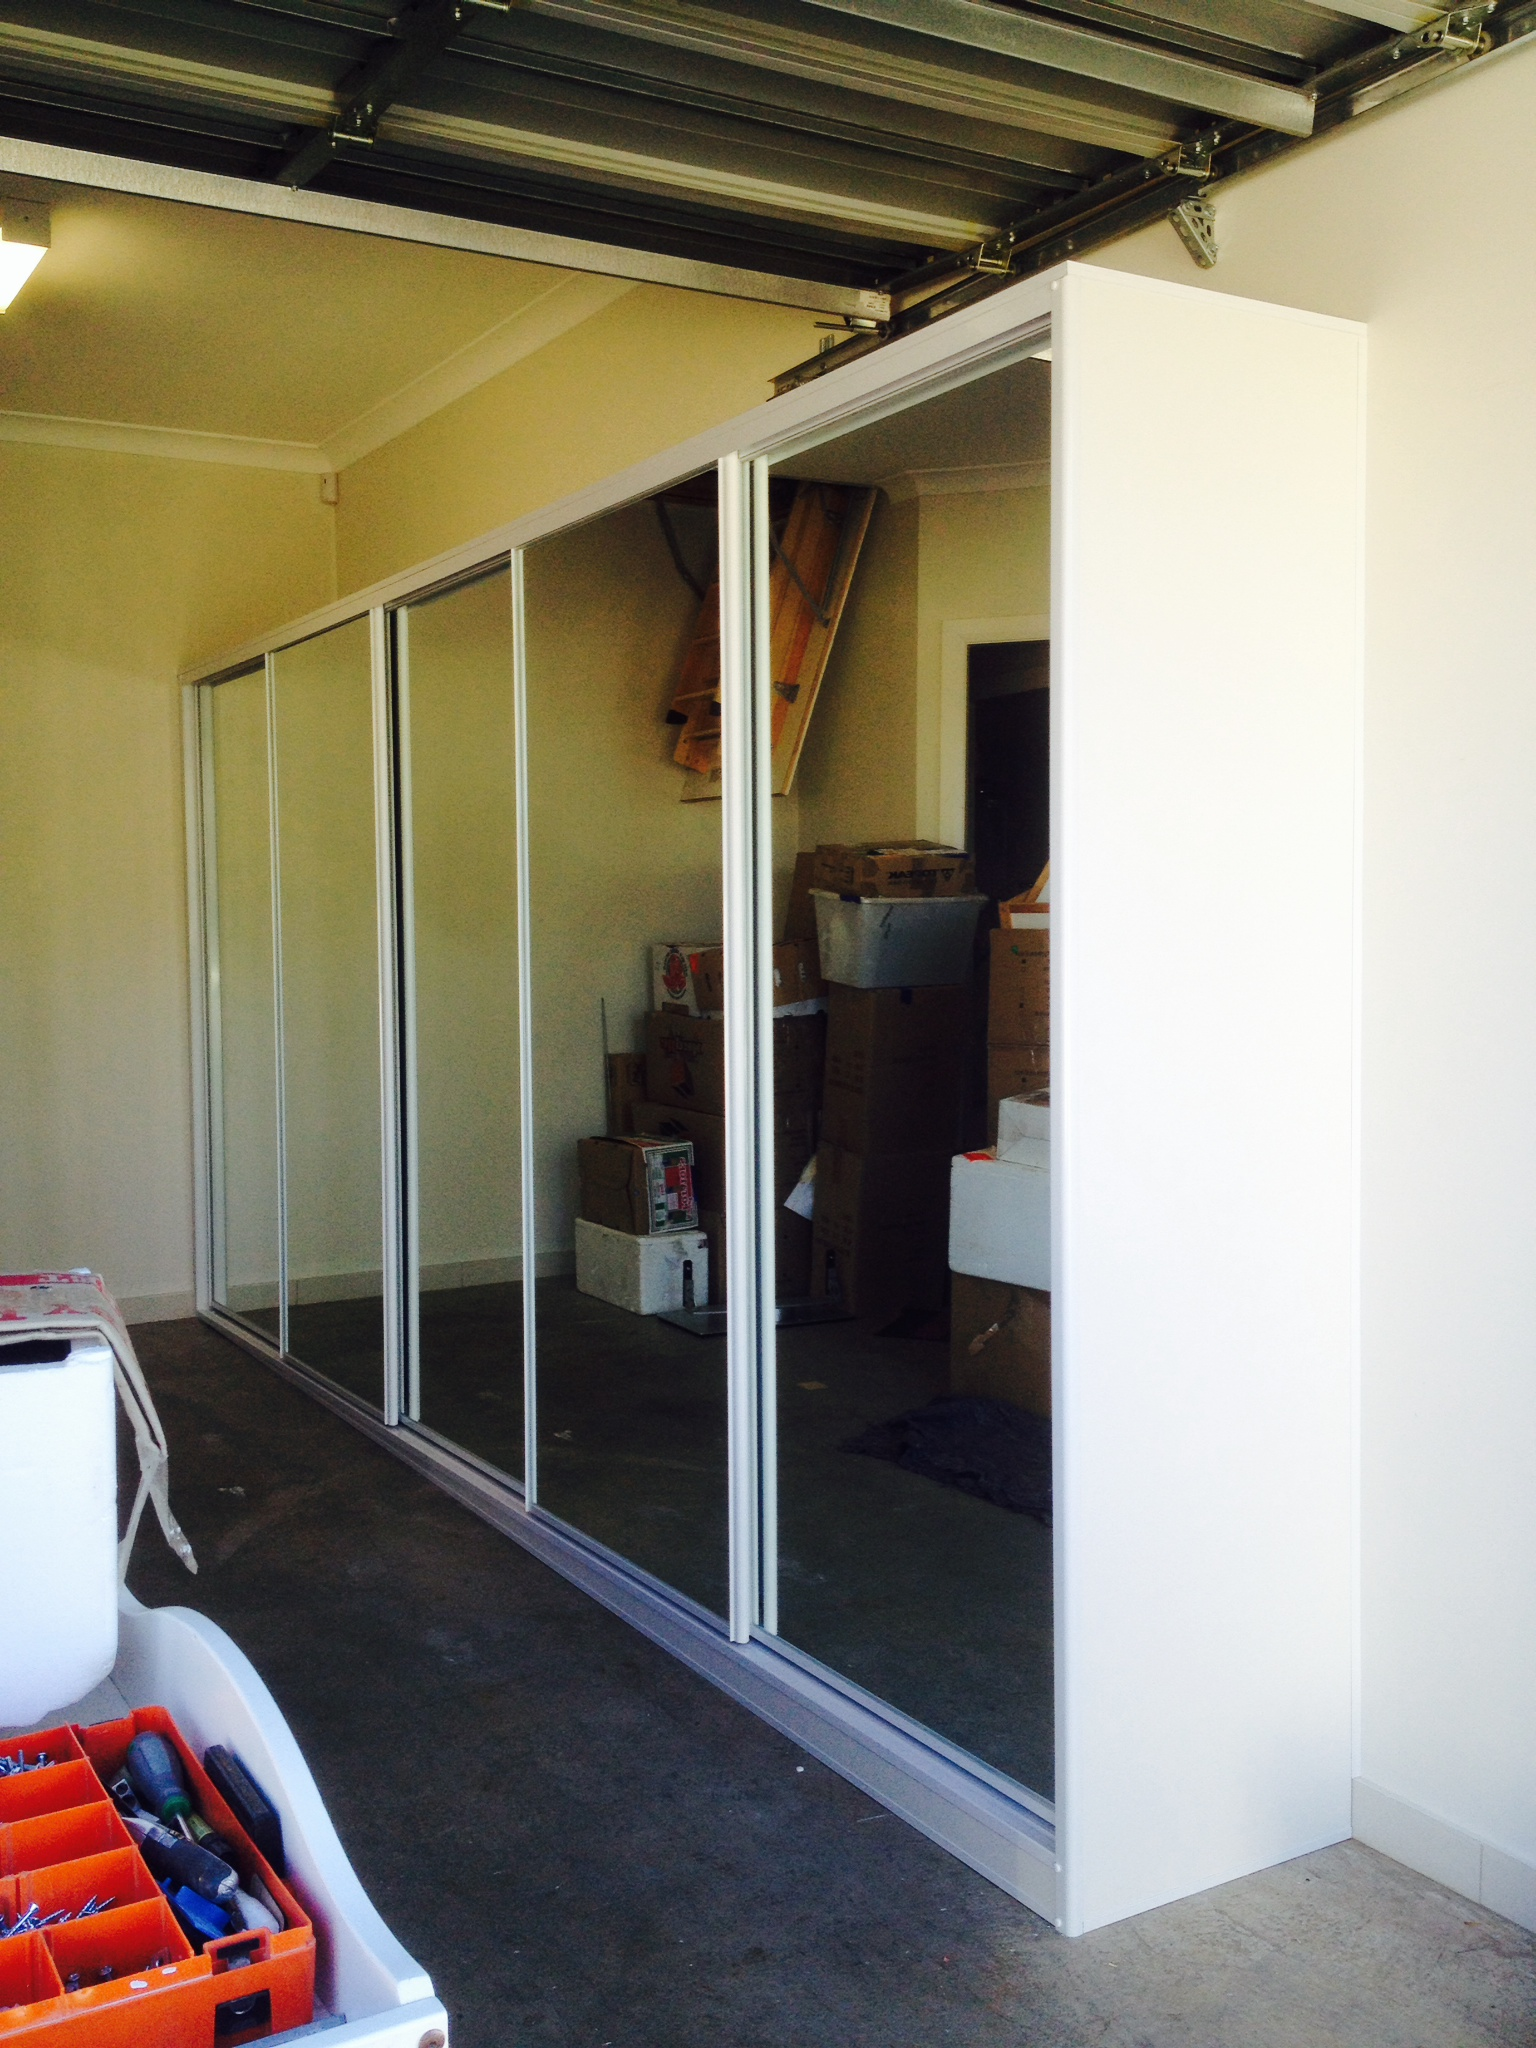 mirror sliding doors in garage.JPG